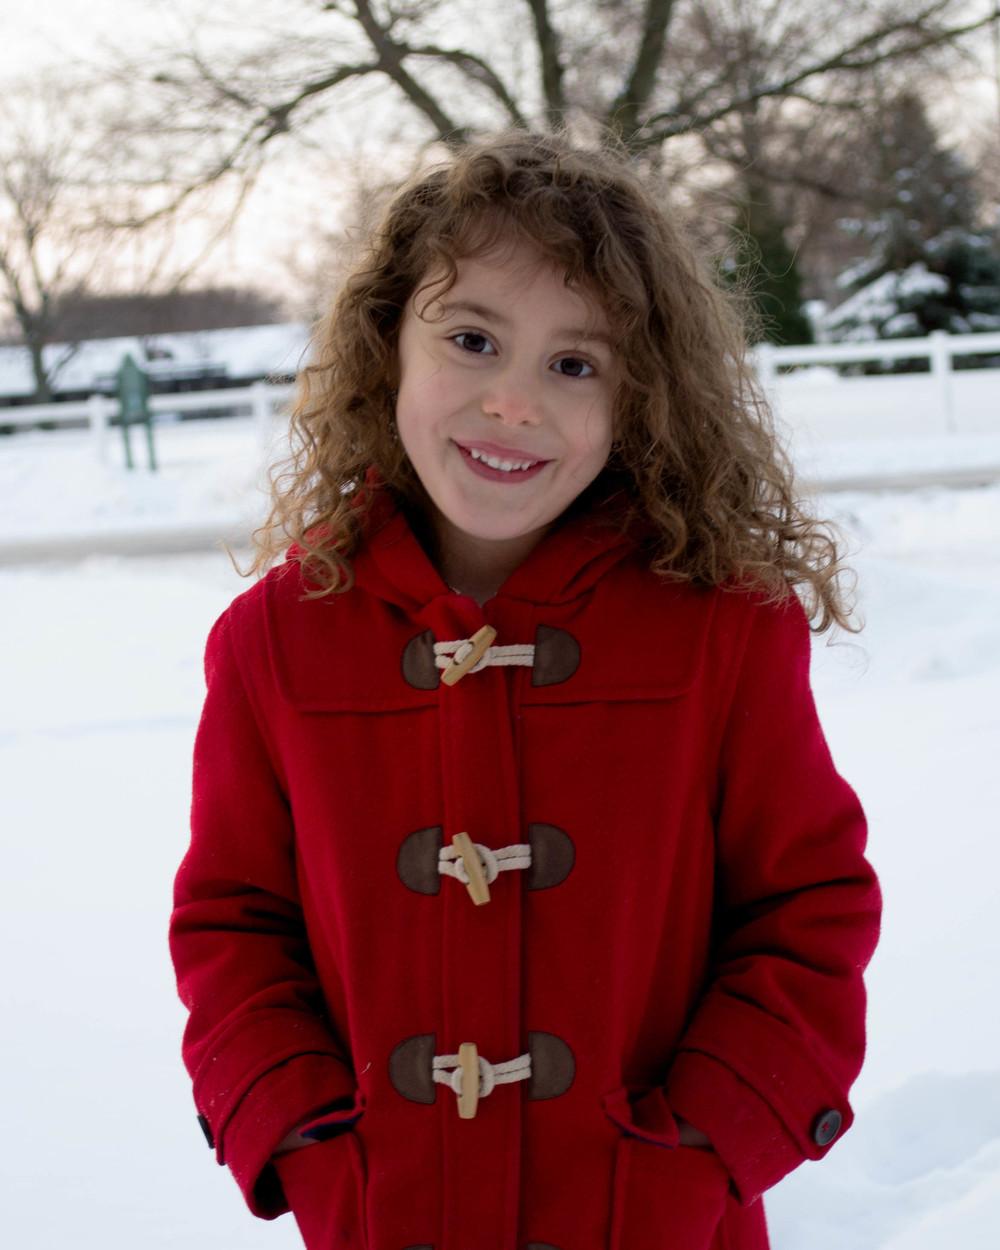 Nigella-2013-December (12 of 23).jpg